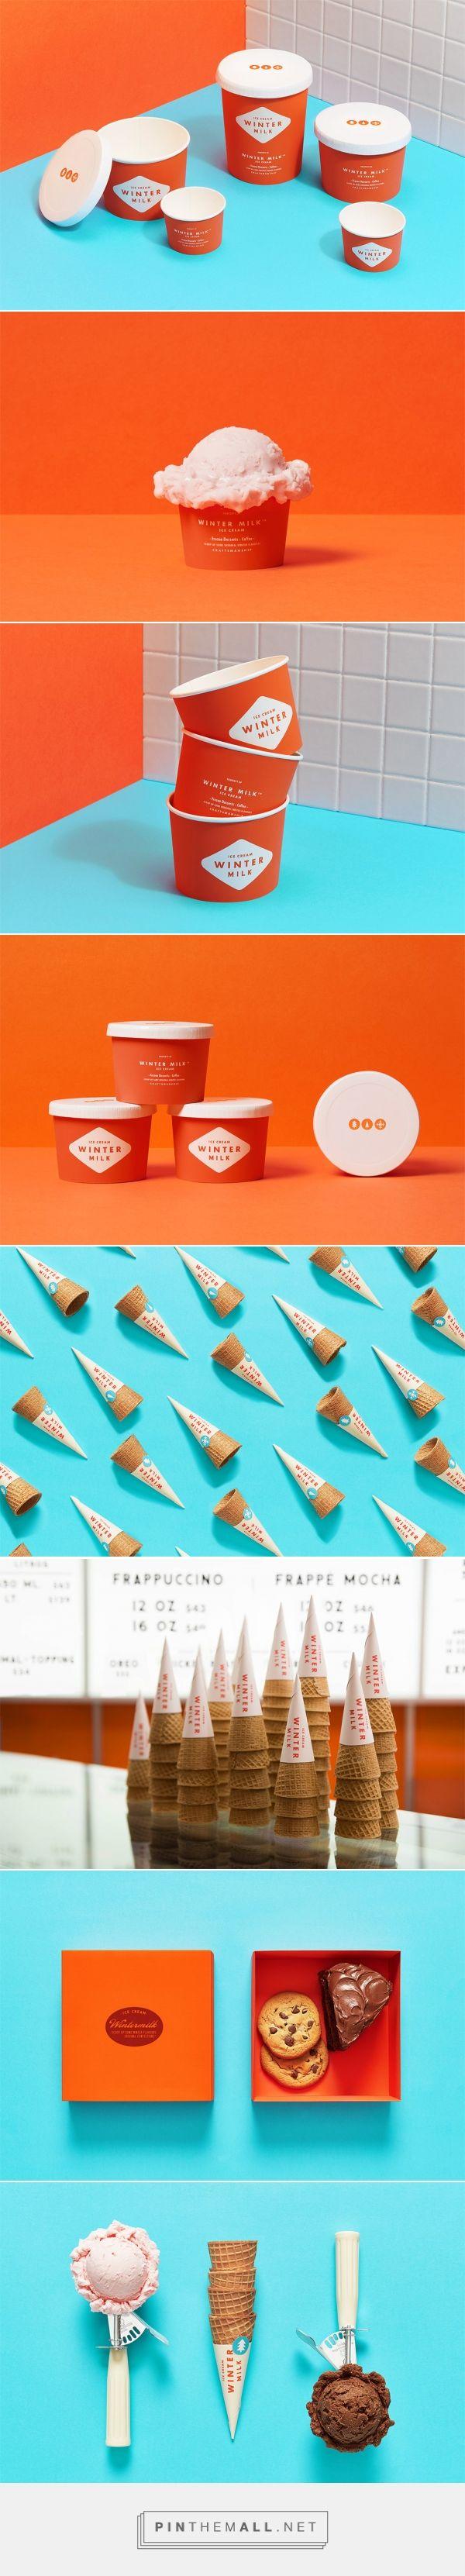 Winter Milk  | Ice Cream Shop design by Anagrama